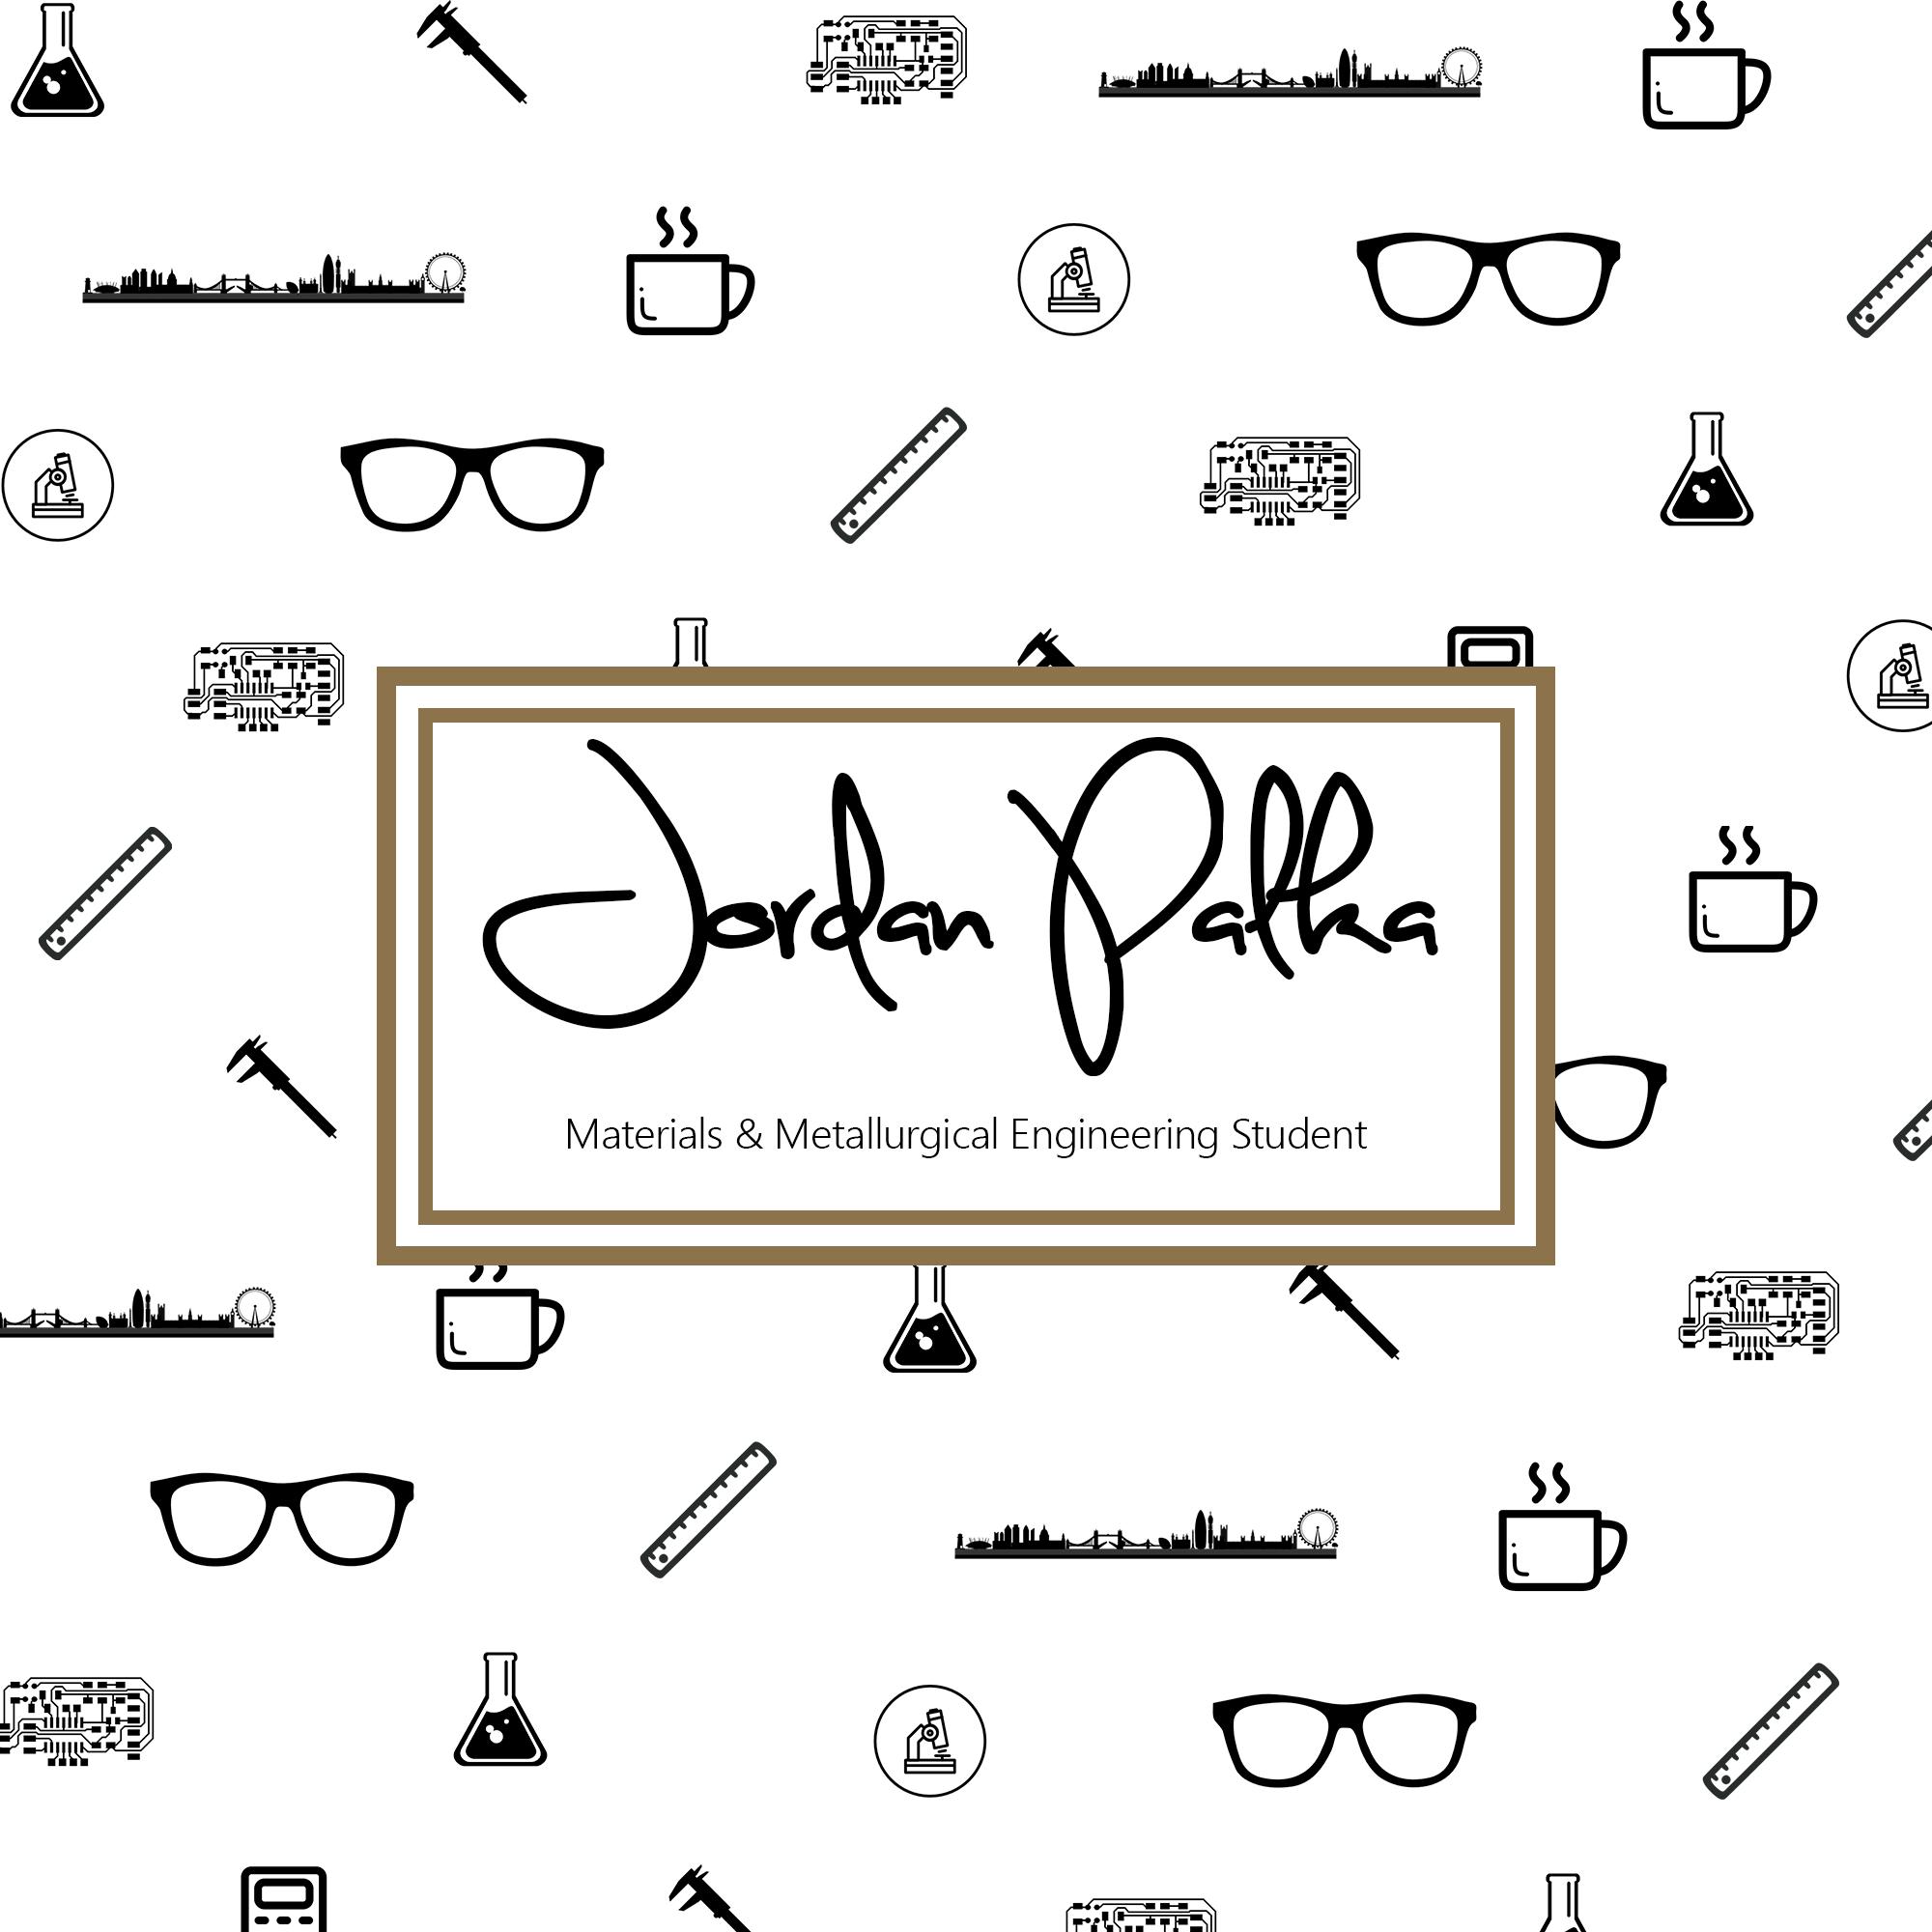 Personal branding ashlee palka jordans business card front magicingreecefo Image collections